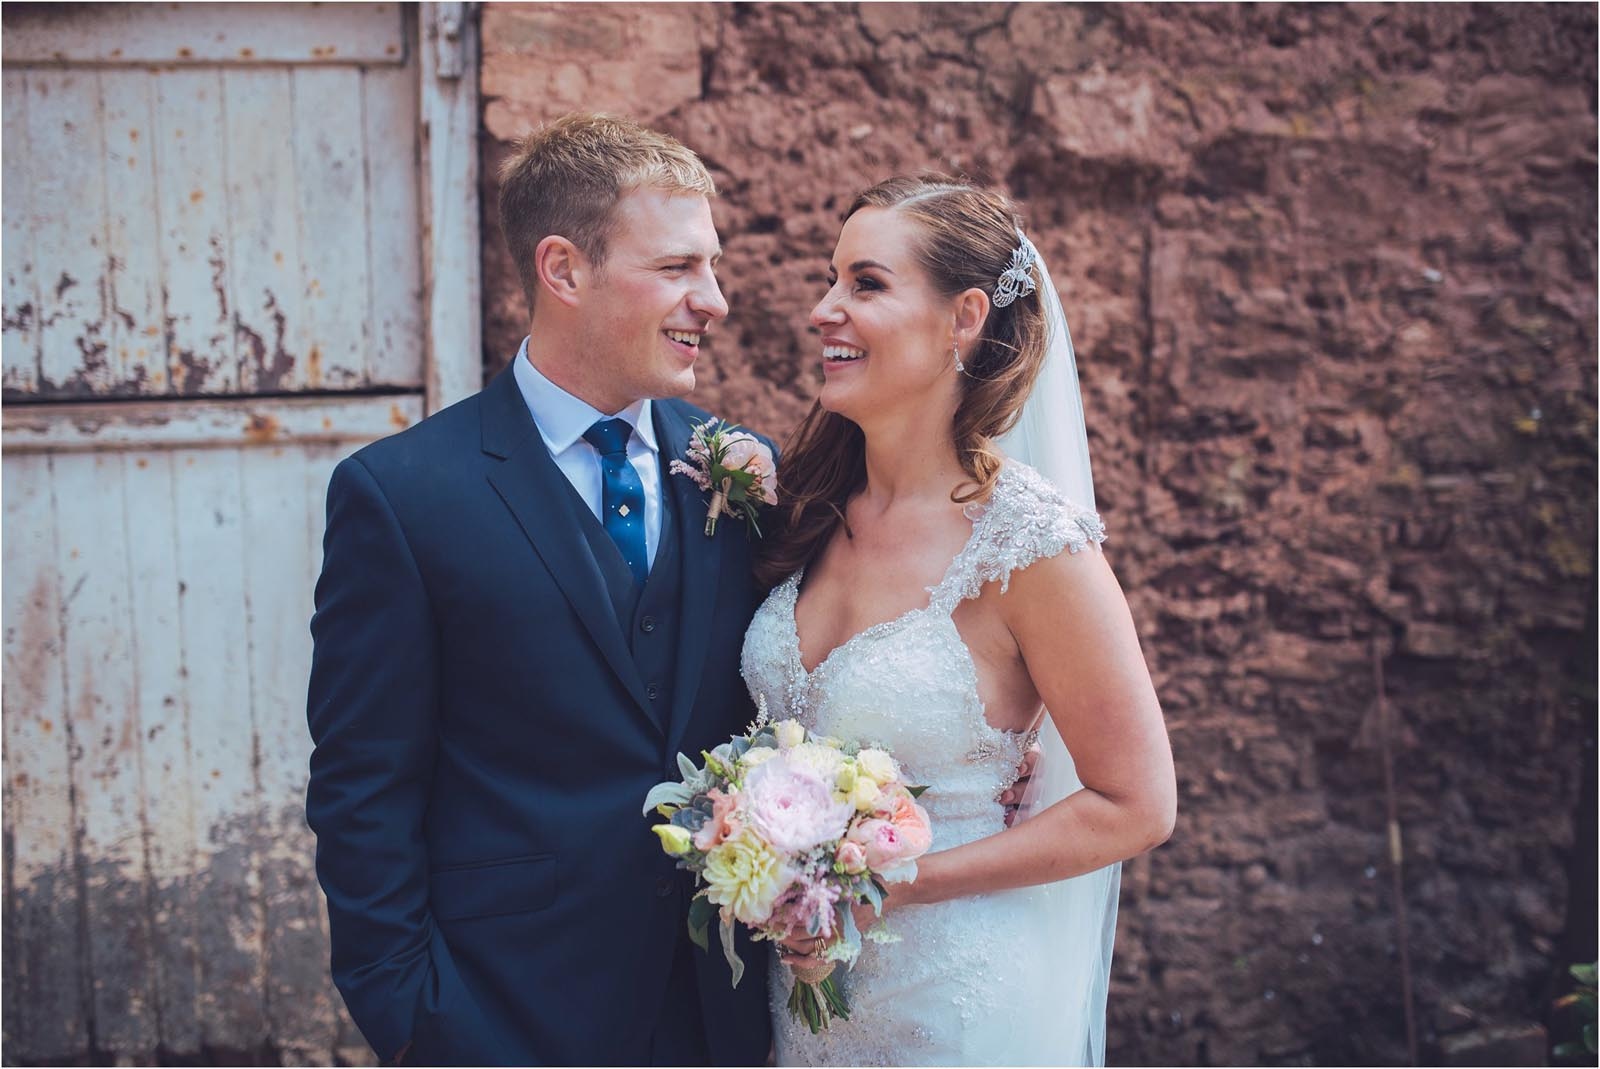 Simon biffen wedding photography 0088